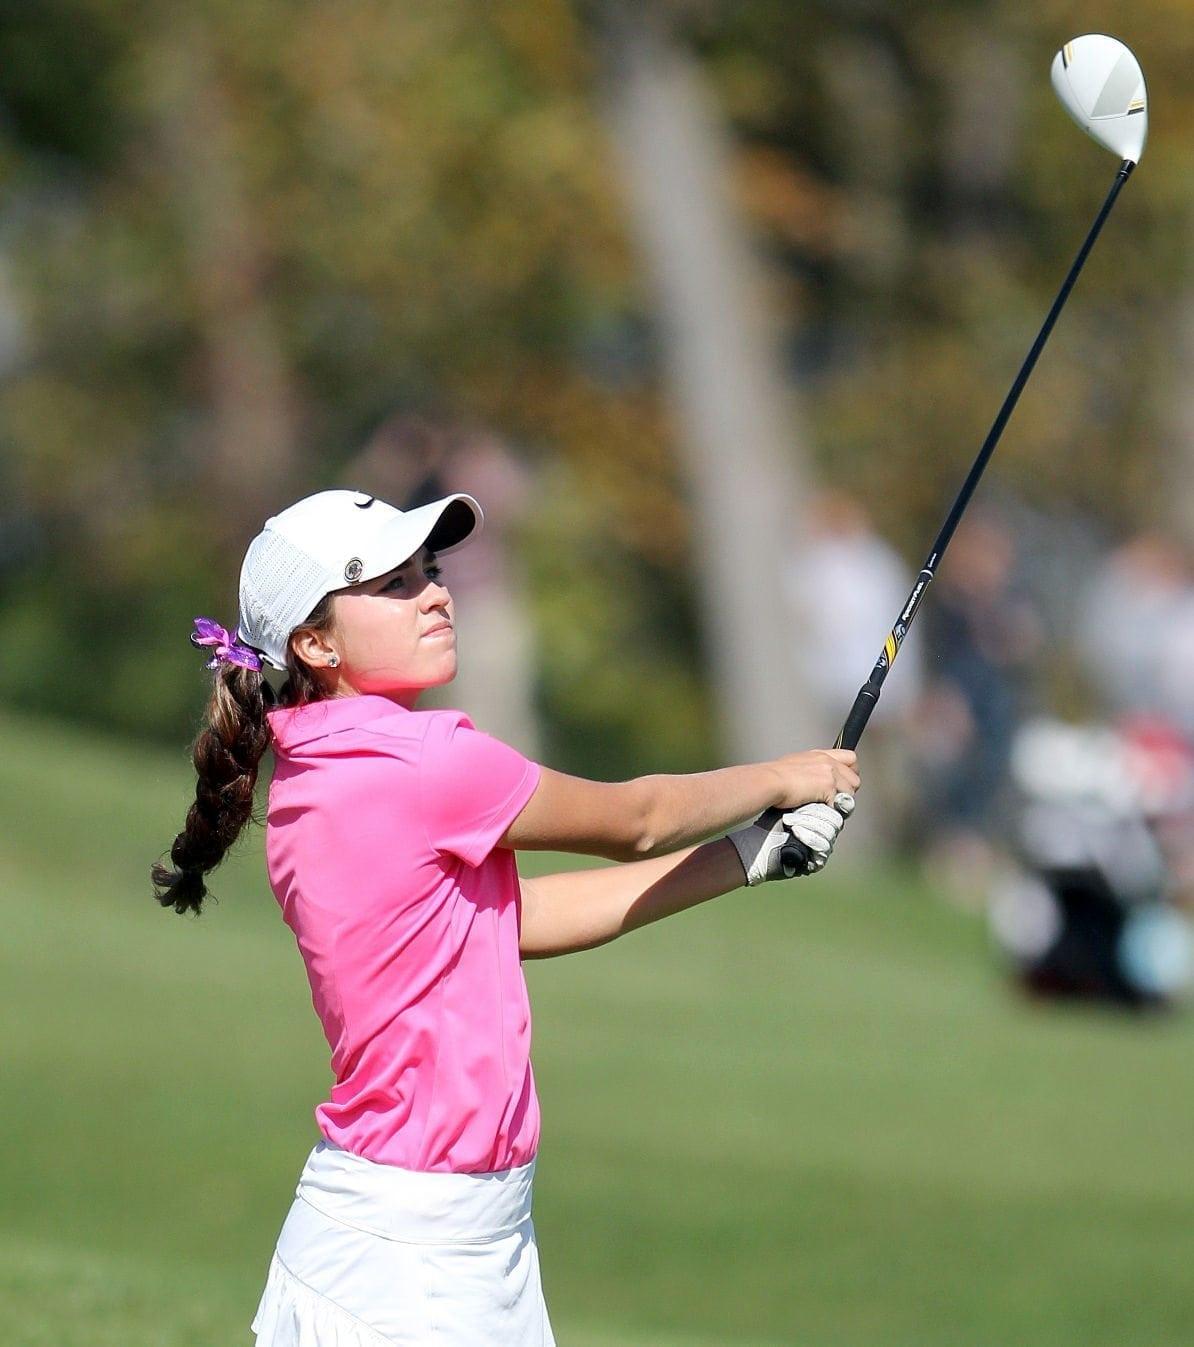 Junior Golfer Girl Golf Scholarships Are Going Unclaimed Golfpsych